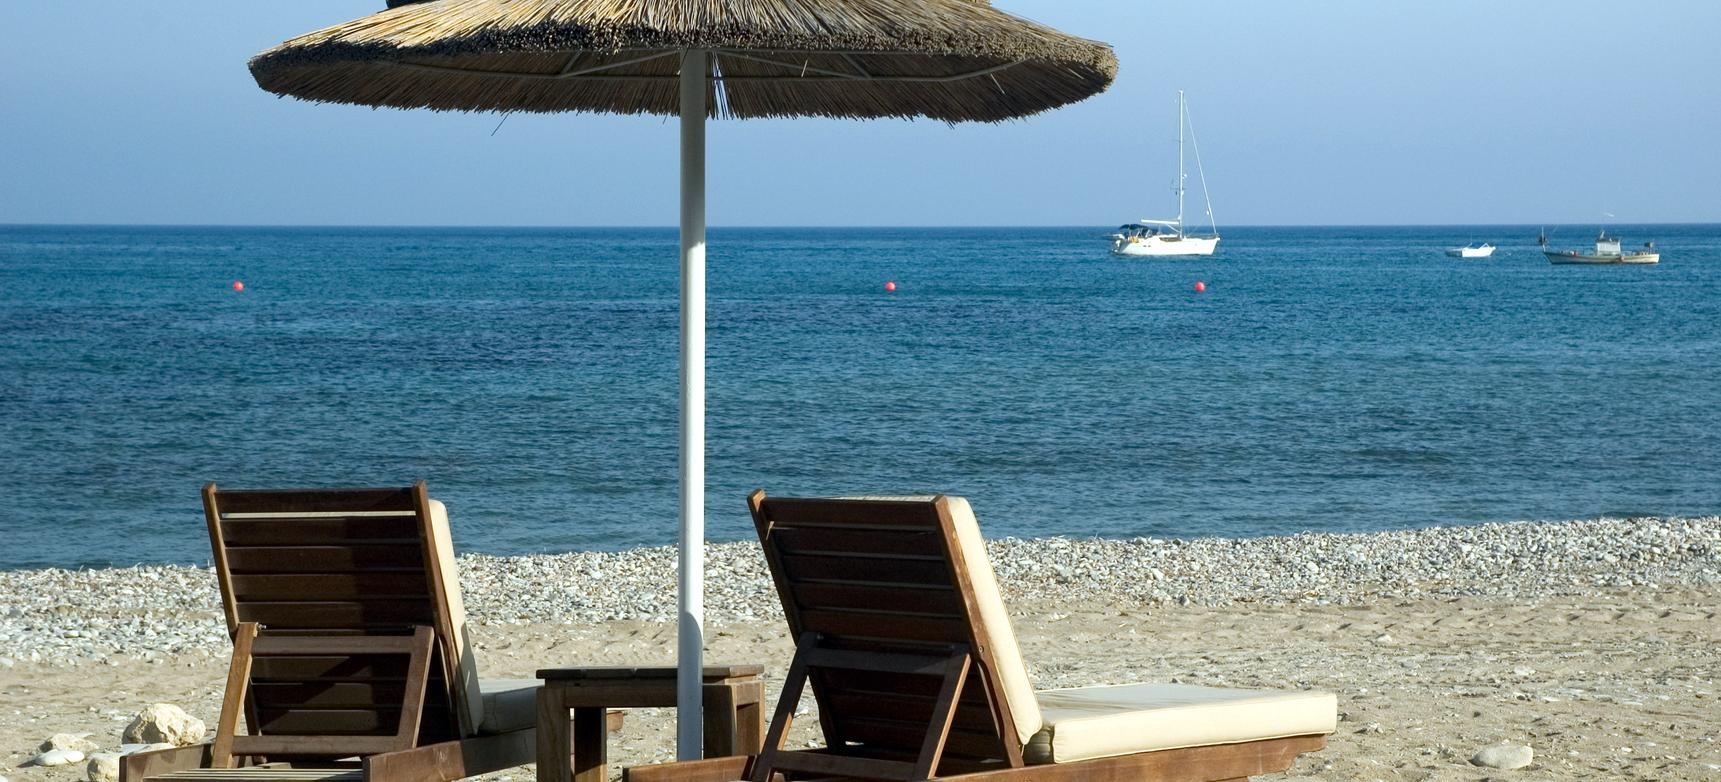 Big beach parasol two chaise longues